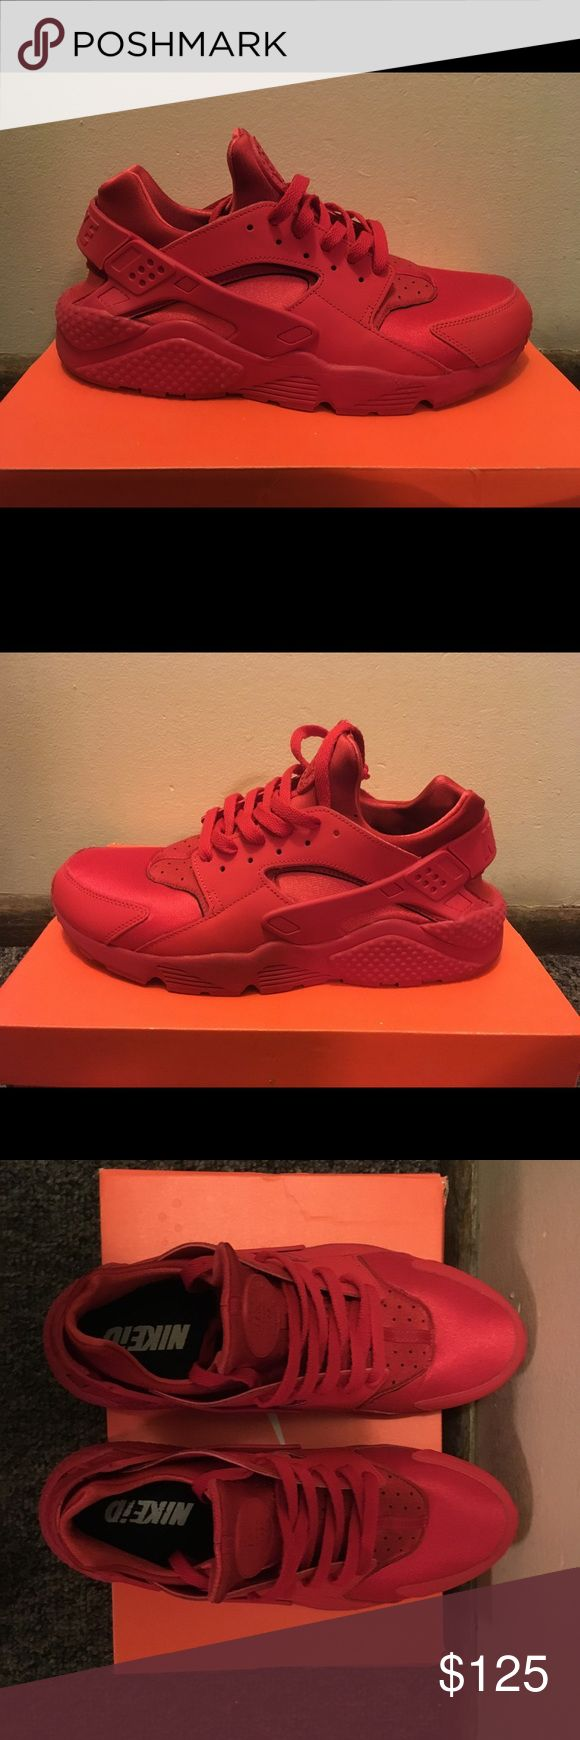 Custom All Red Nike Air Huarache Like New!!! Only been worn 3 times. Comes in orange Nike shoe box. Nike Shoes Sneakers